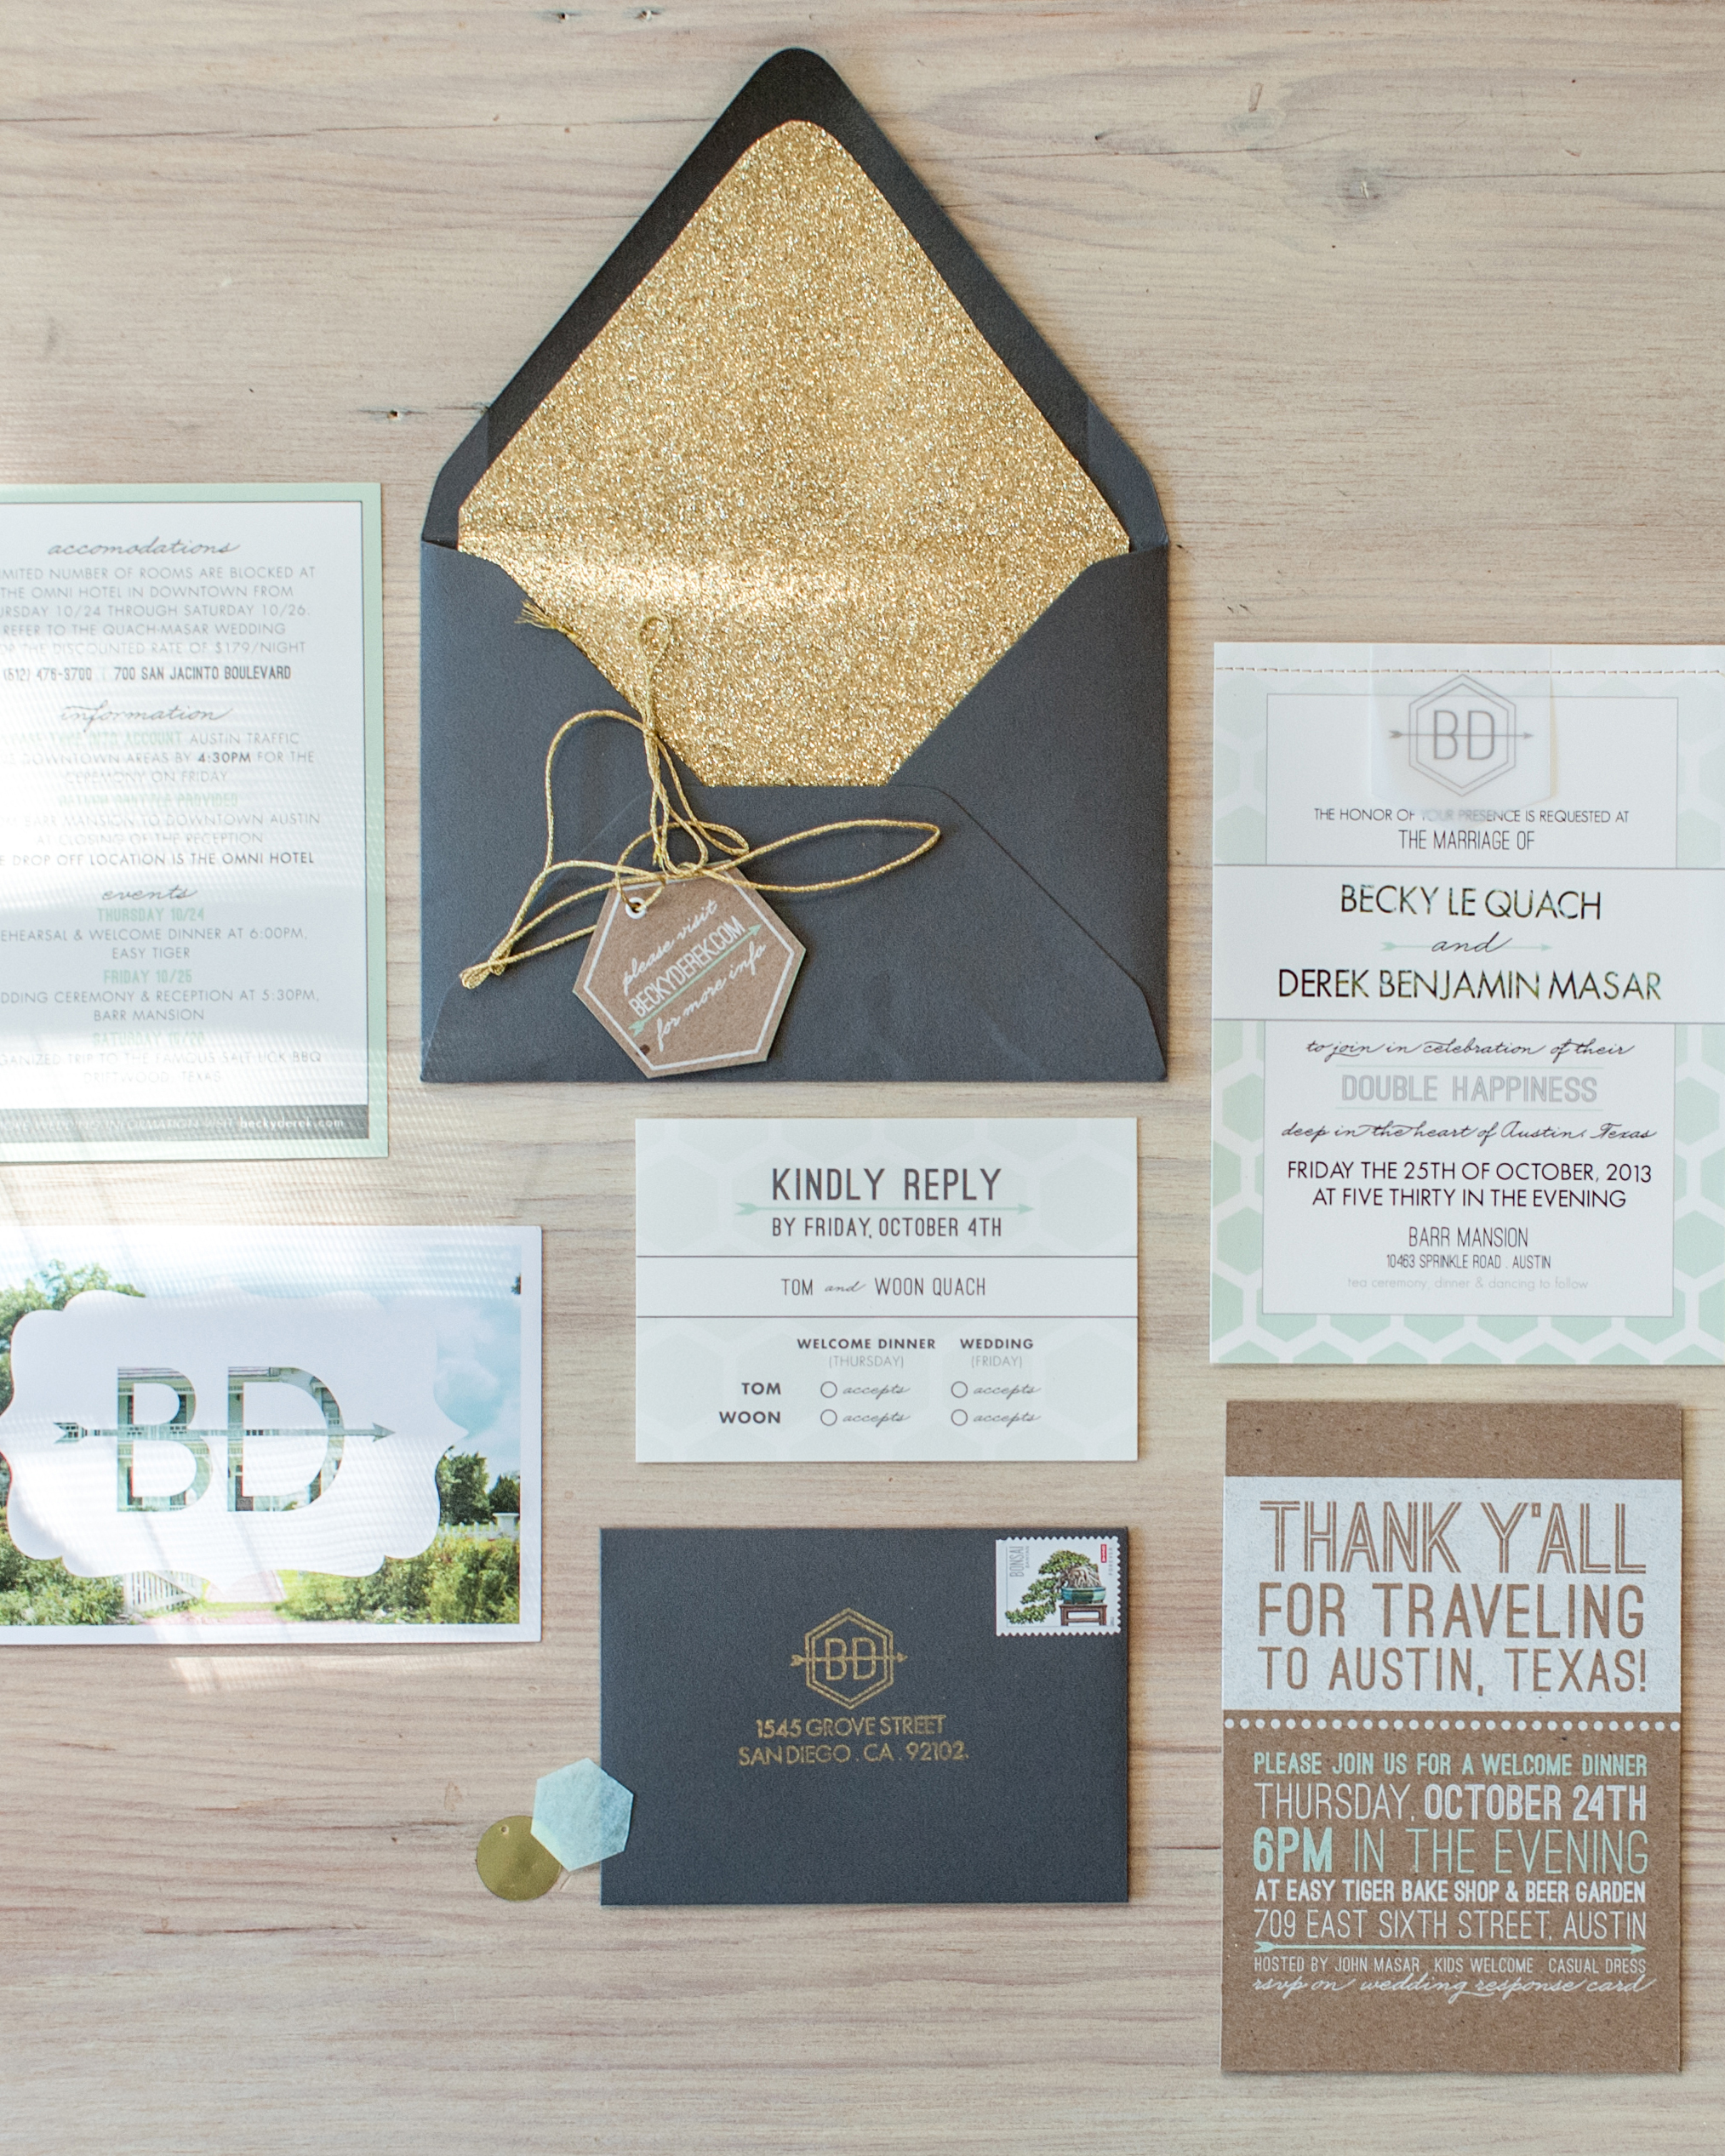 becky-derrick-wedding-stationery-0714.jpg